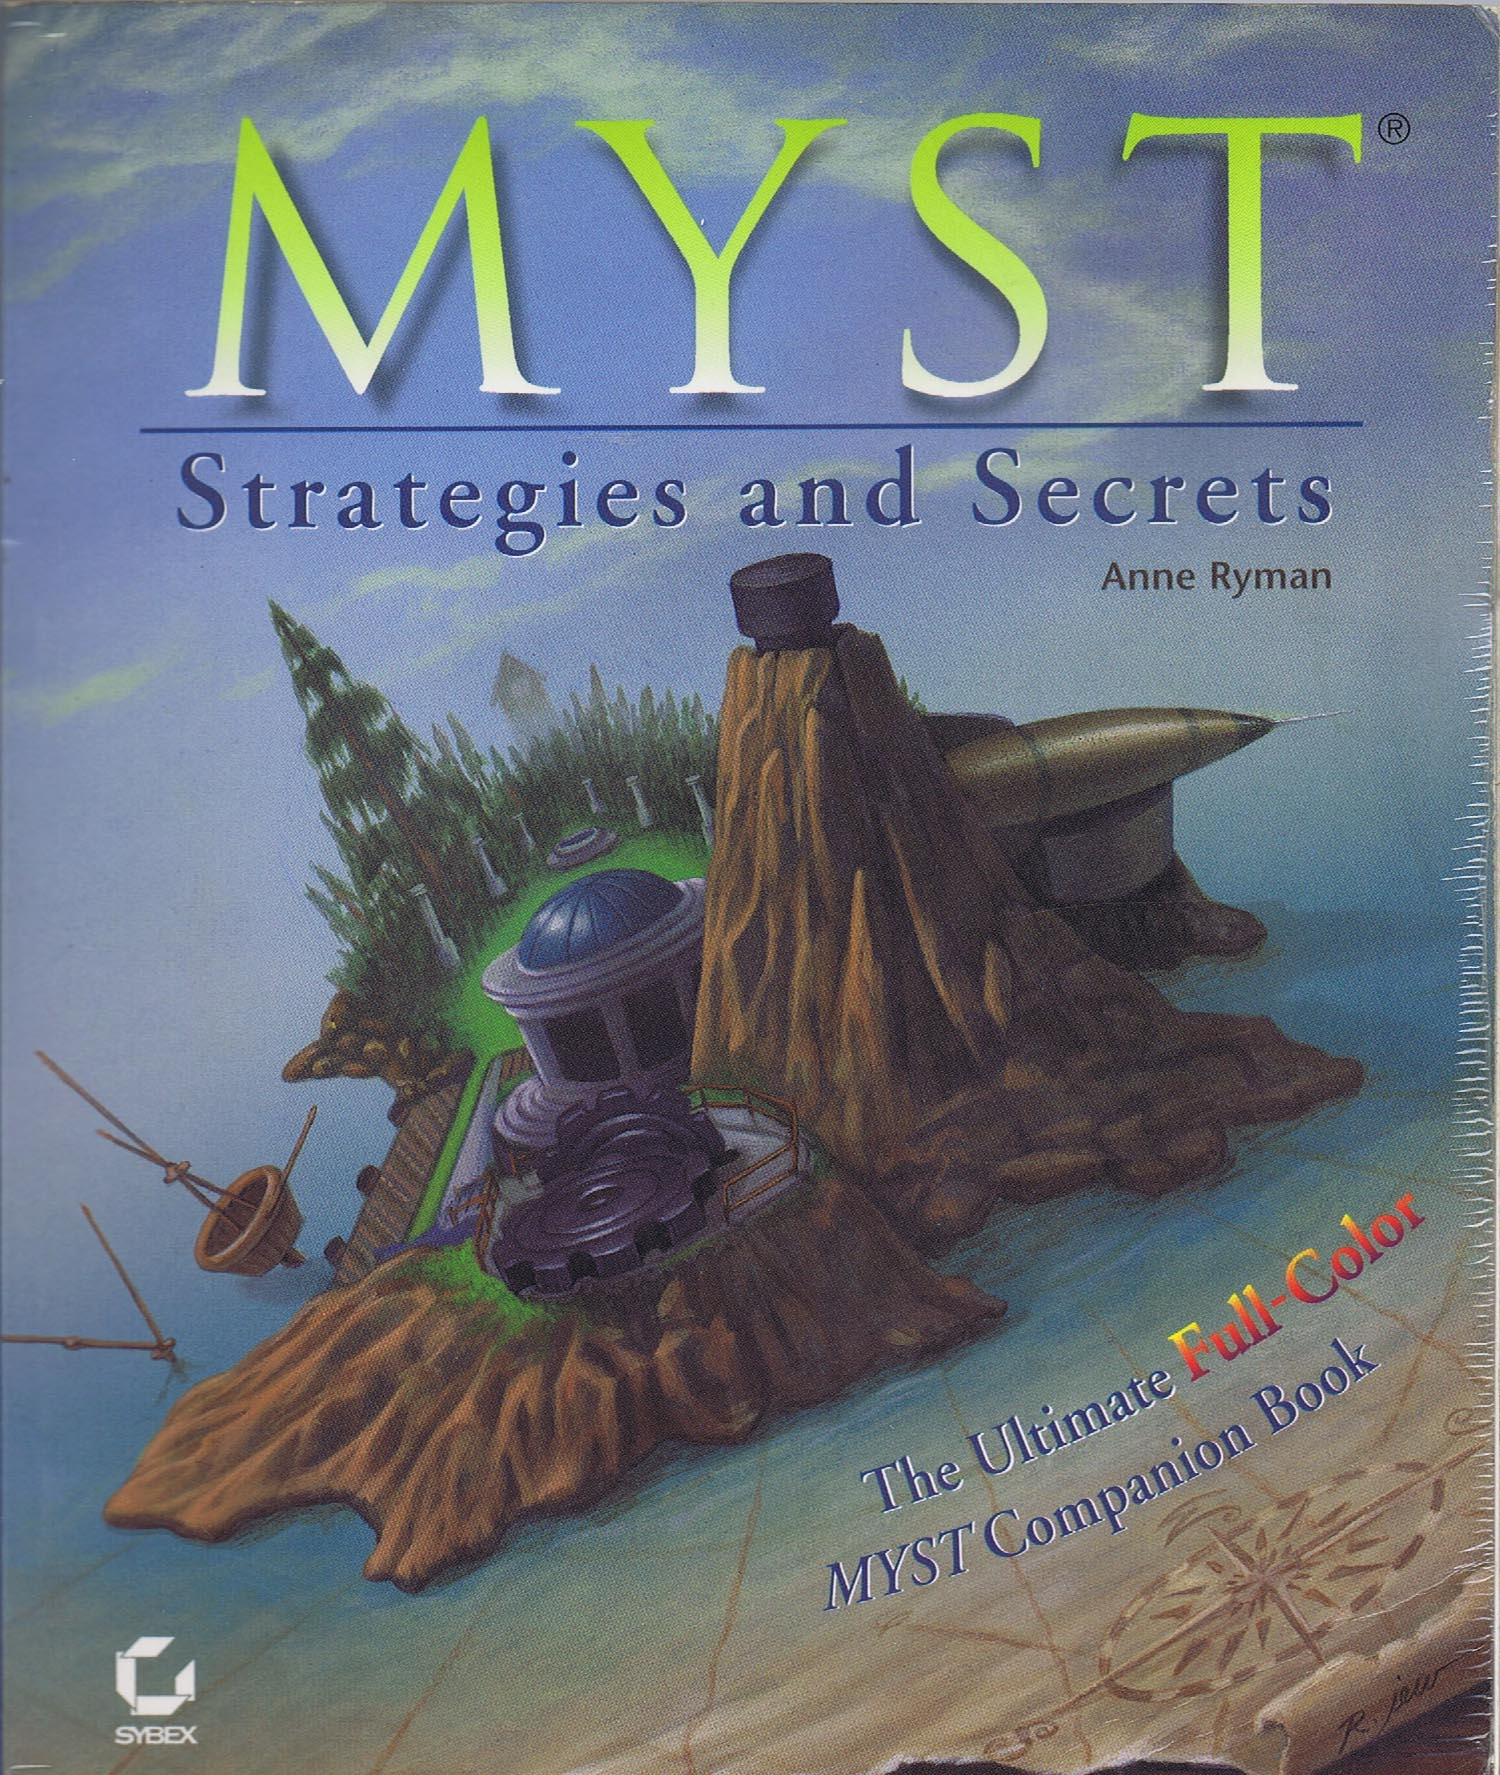 Myst: Strategies and Secrets